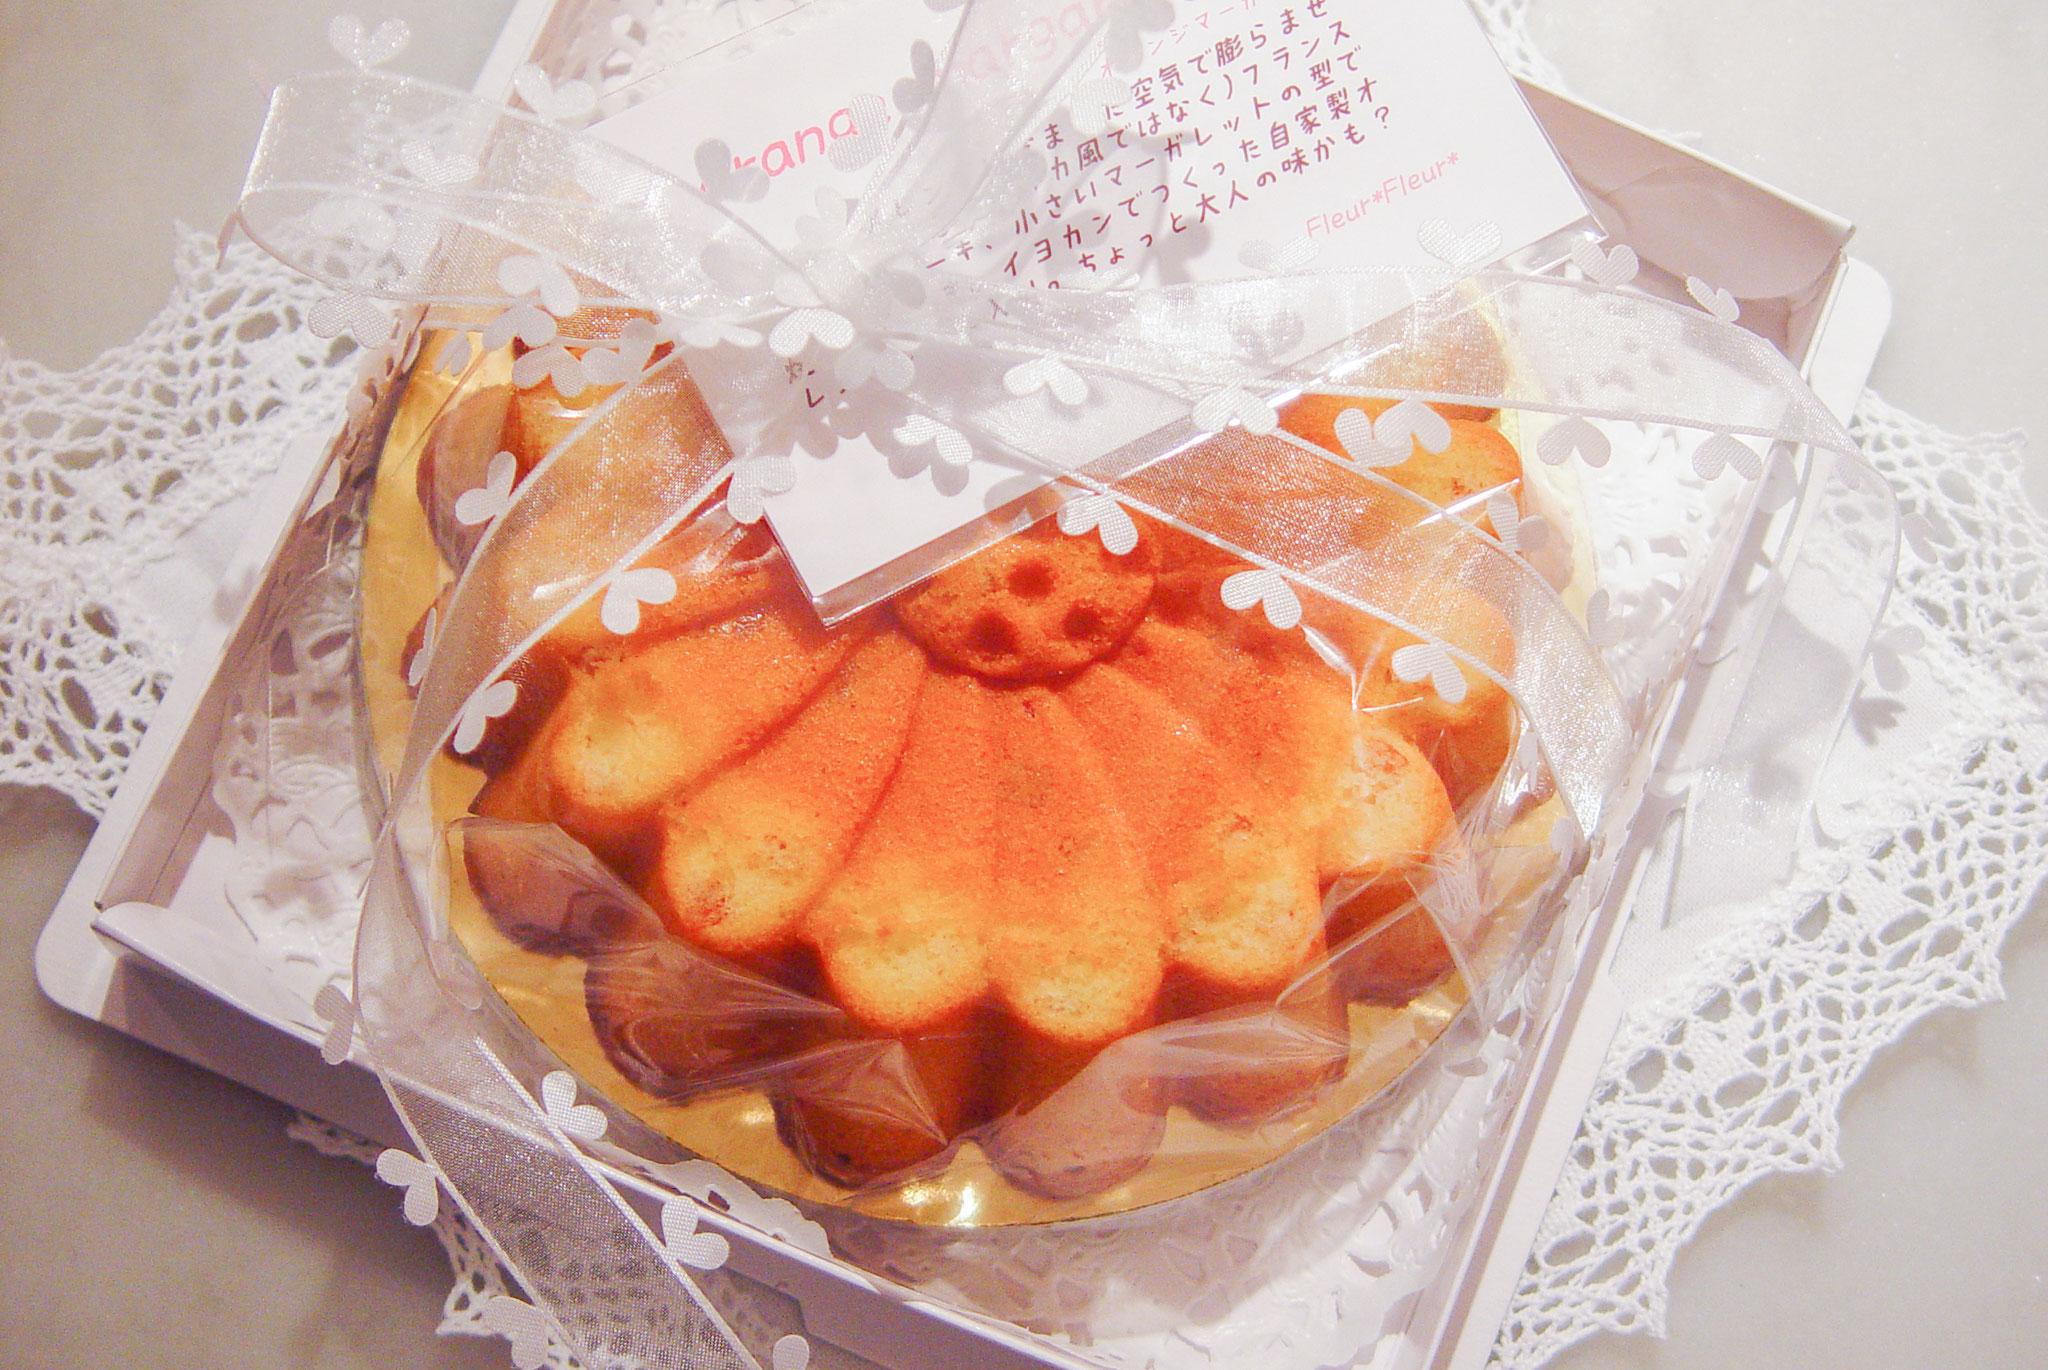 gateau aux oranges  オレンジマーガレット